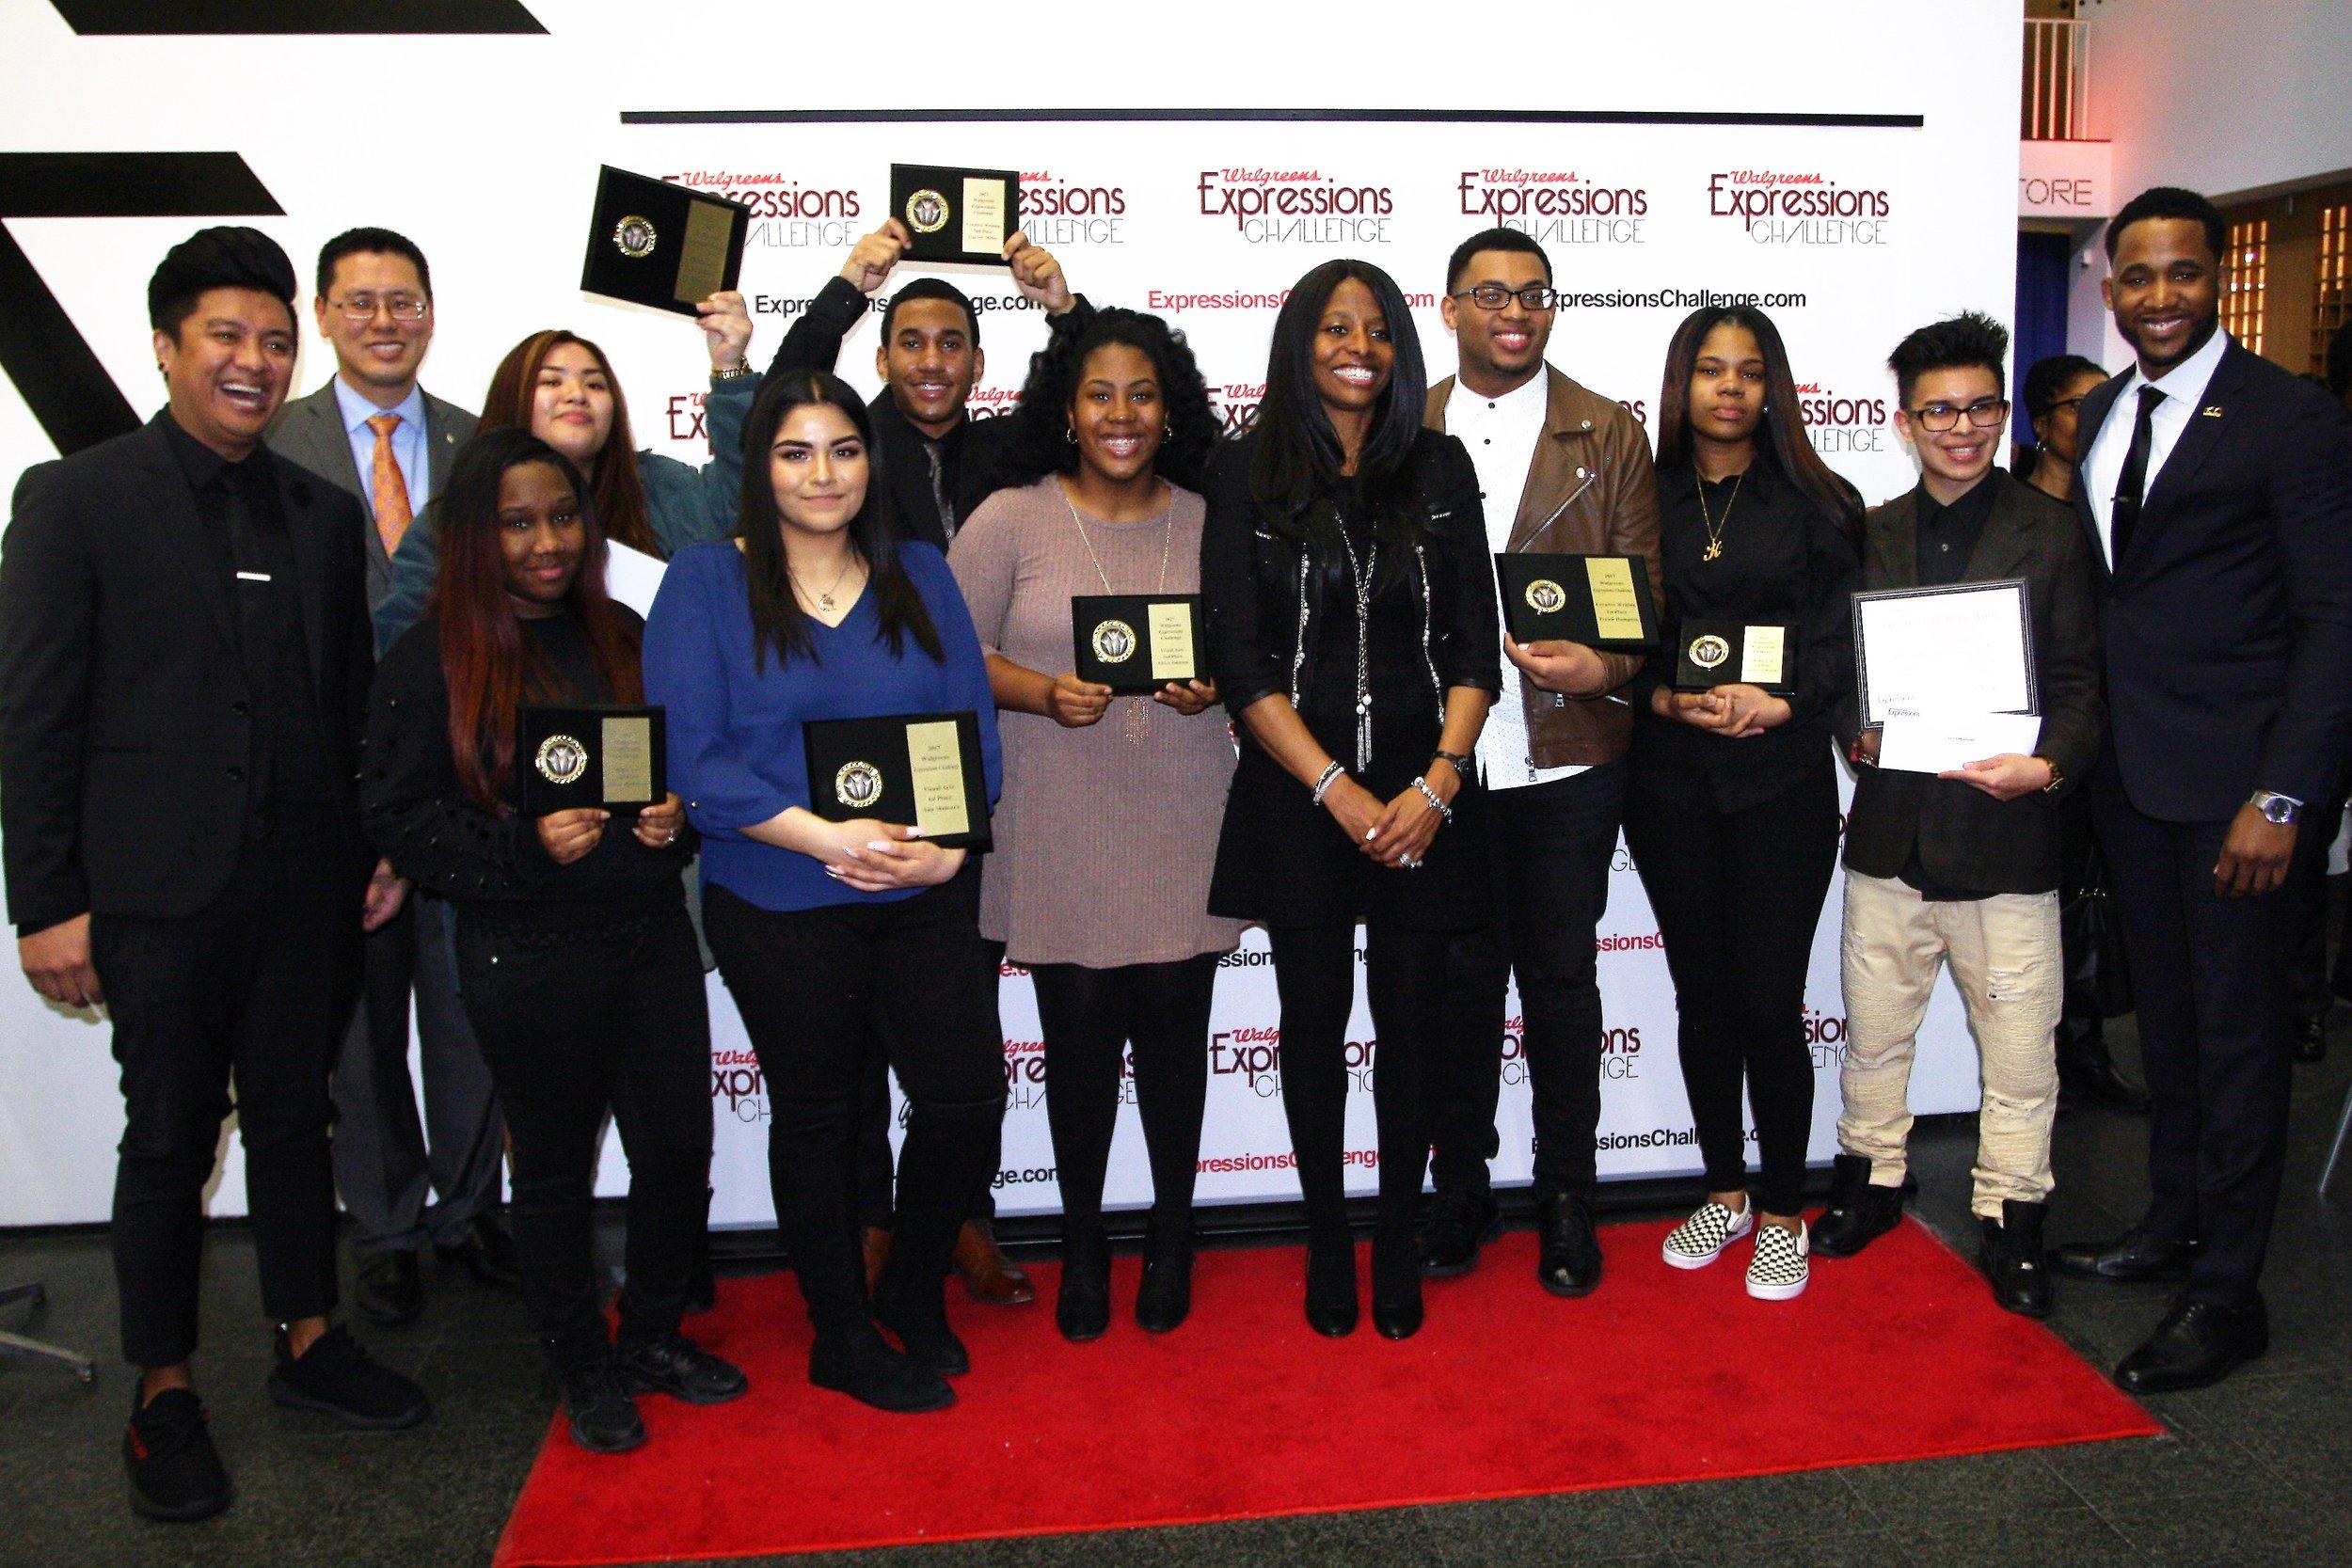 Ashton Clark, MBA, storyteller, motivational speaker, information technology leader, intrapreneur and nationally award-winning entrepreneur at Walgreens Expression Challenge